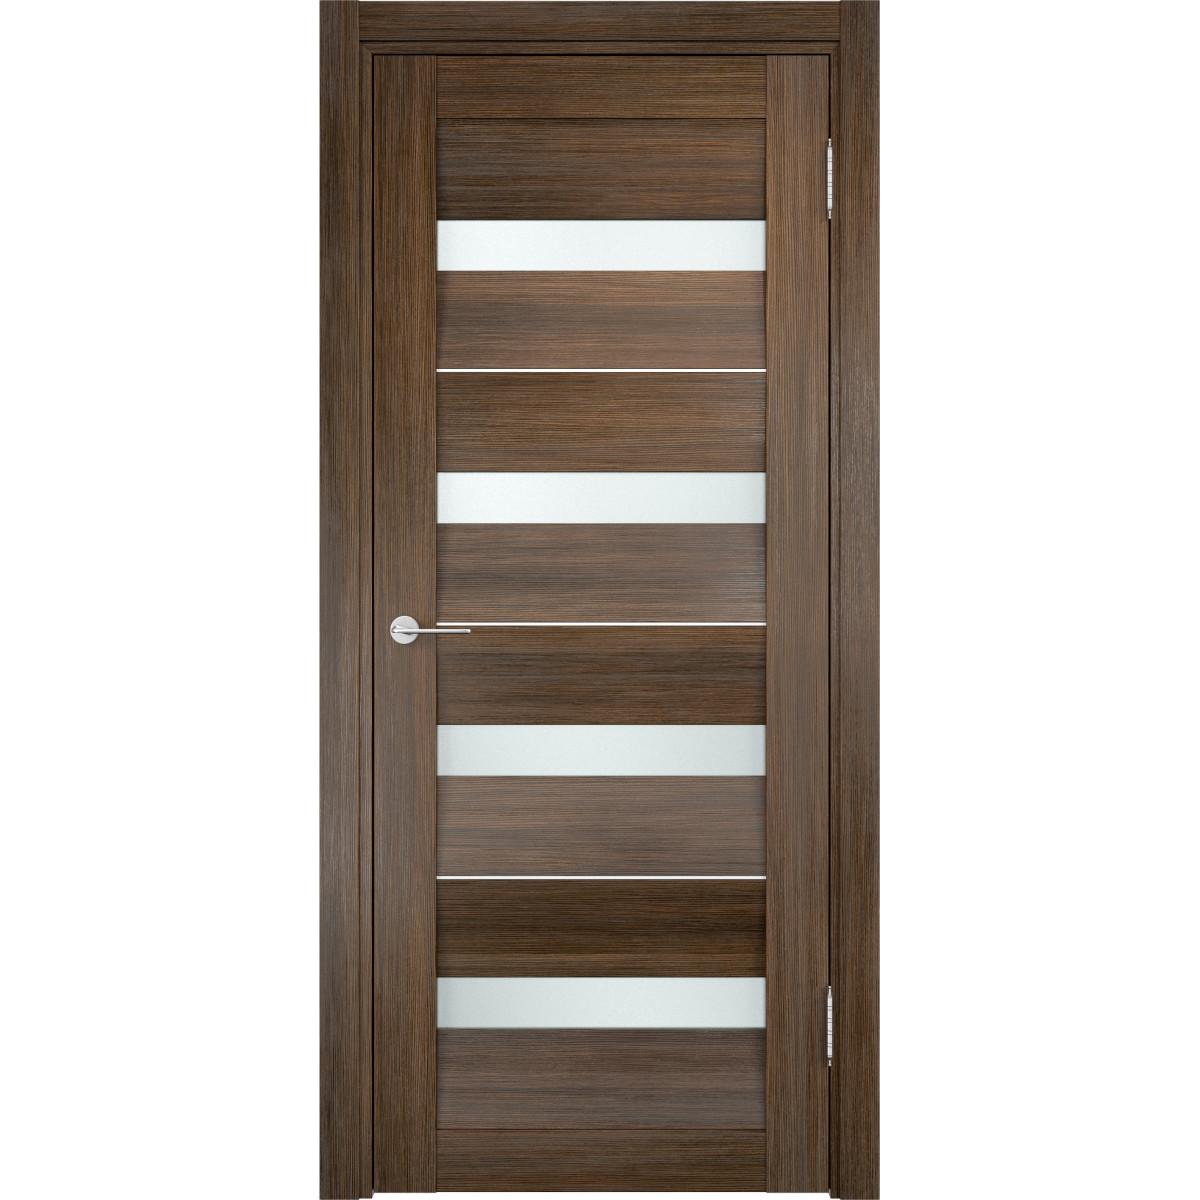 Дверное полотно Casaporte Сицилия МП_0138 2000х700х44 мм МДФ